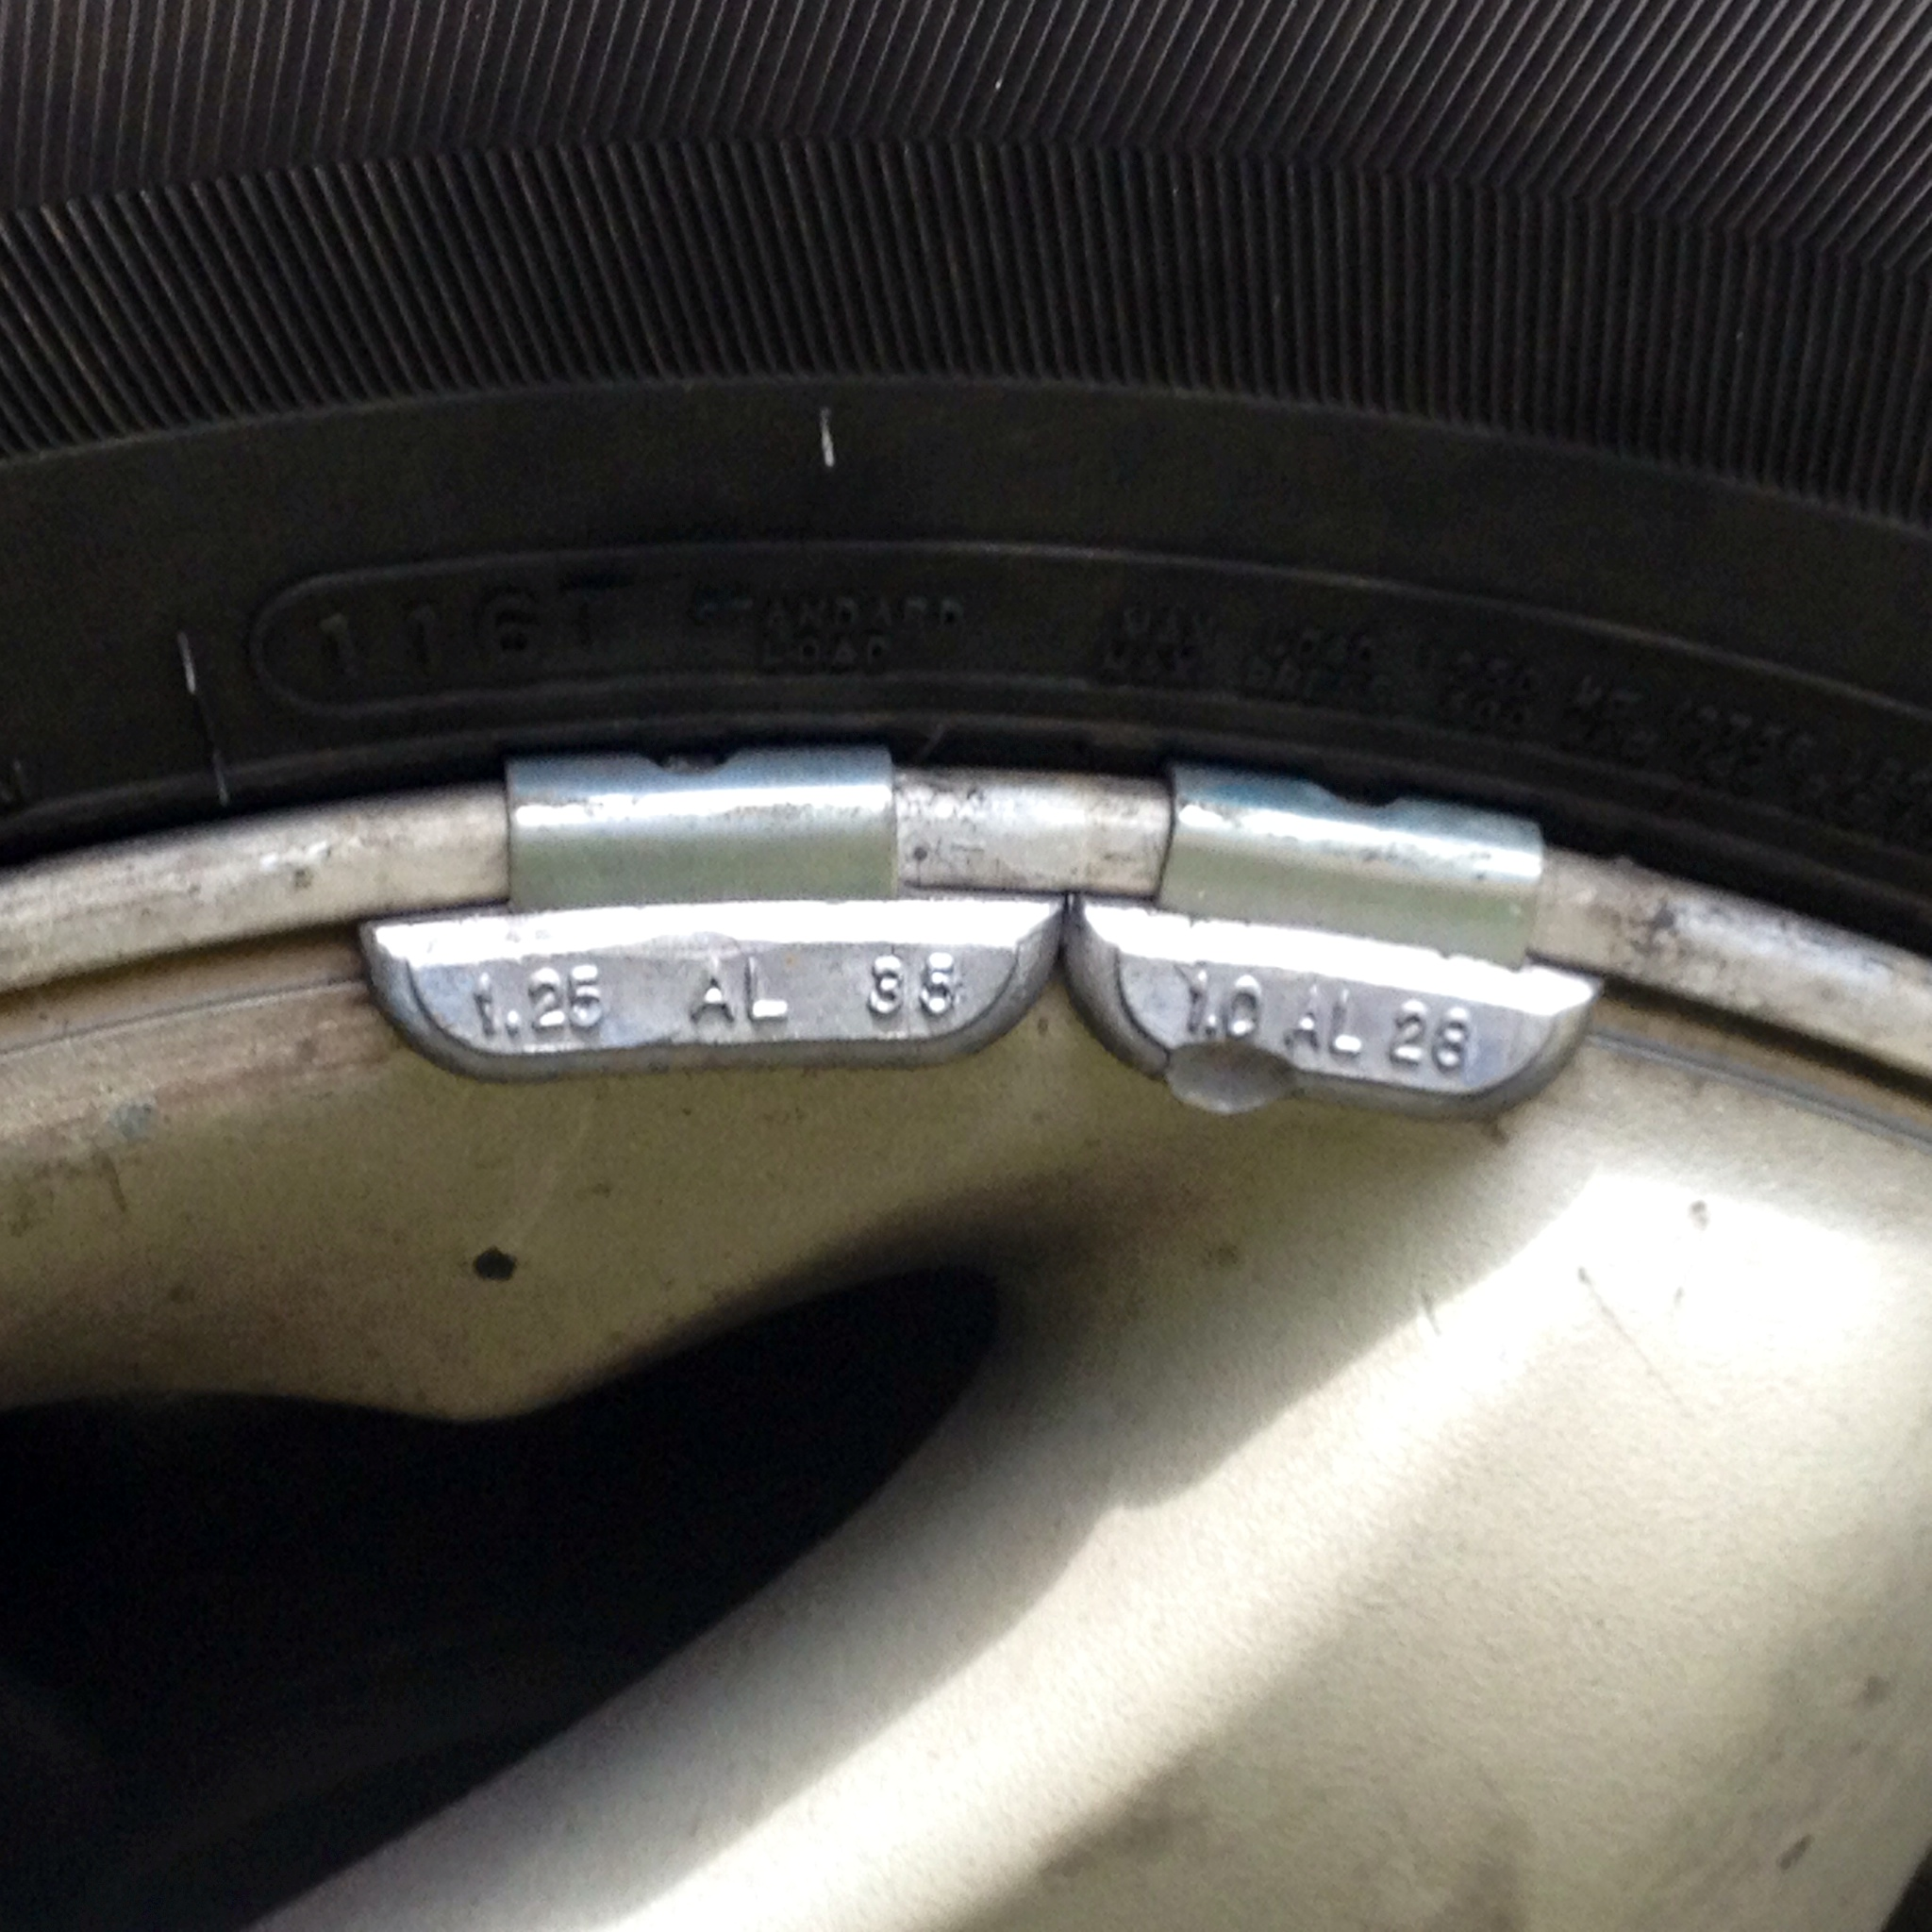 Minnesota Lead Wheel Weight Bill Heads to Governor